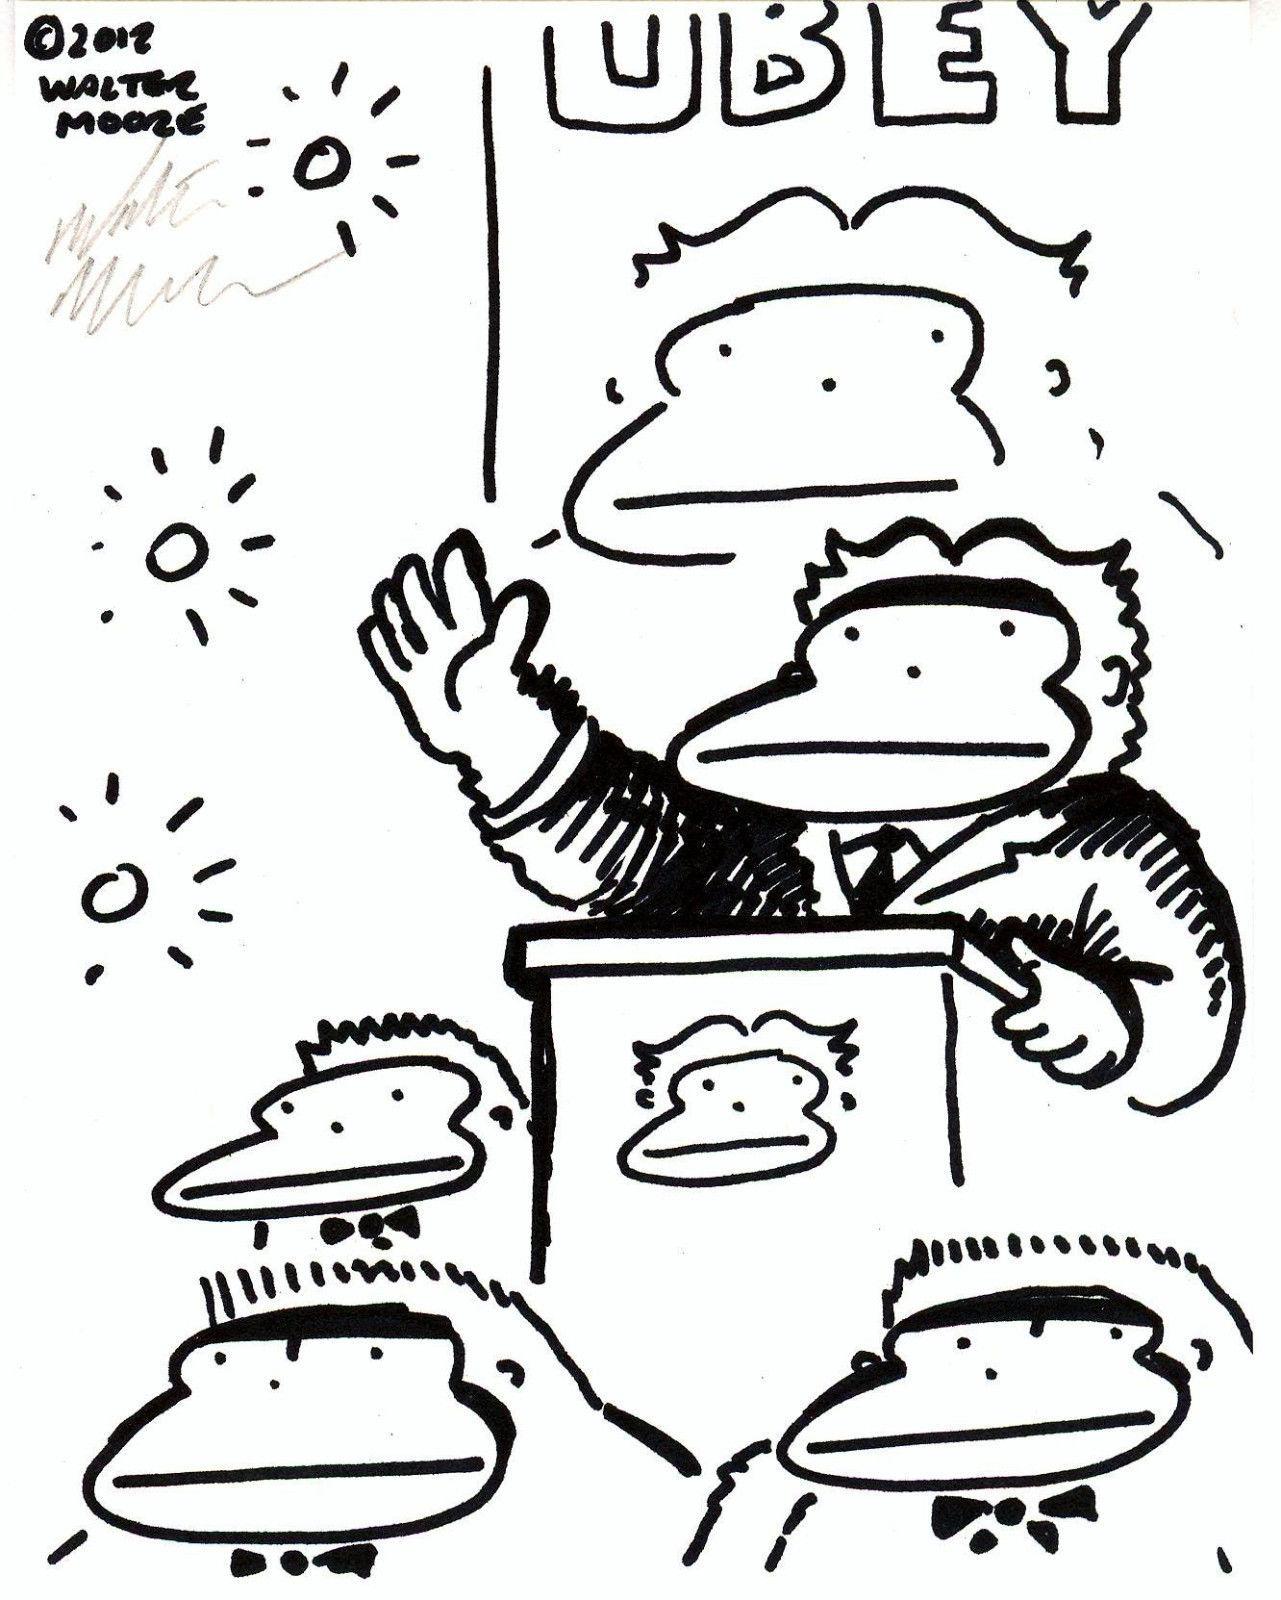 Supreme Leader Ape. Original Signed Cartoon by Walter Moore 31D12